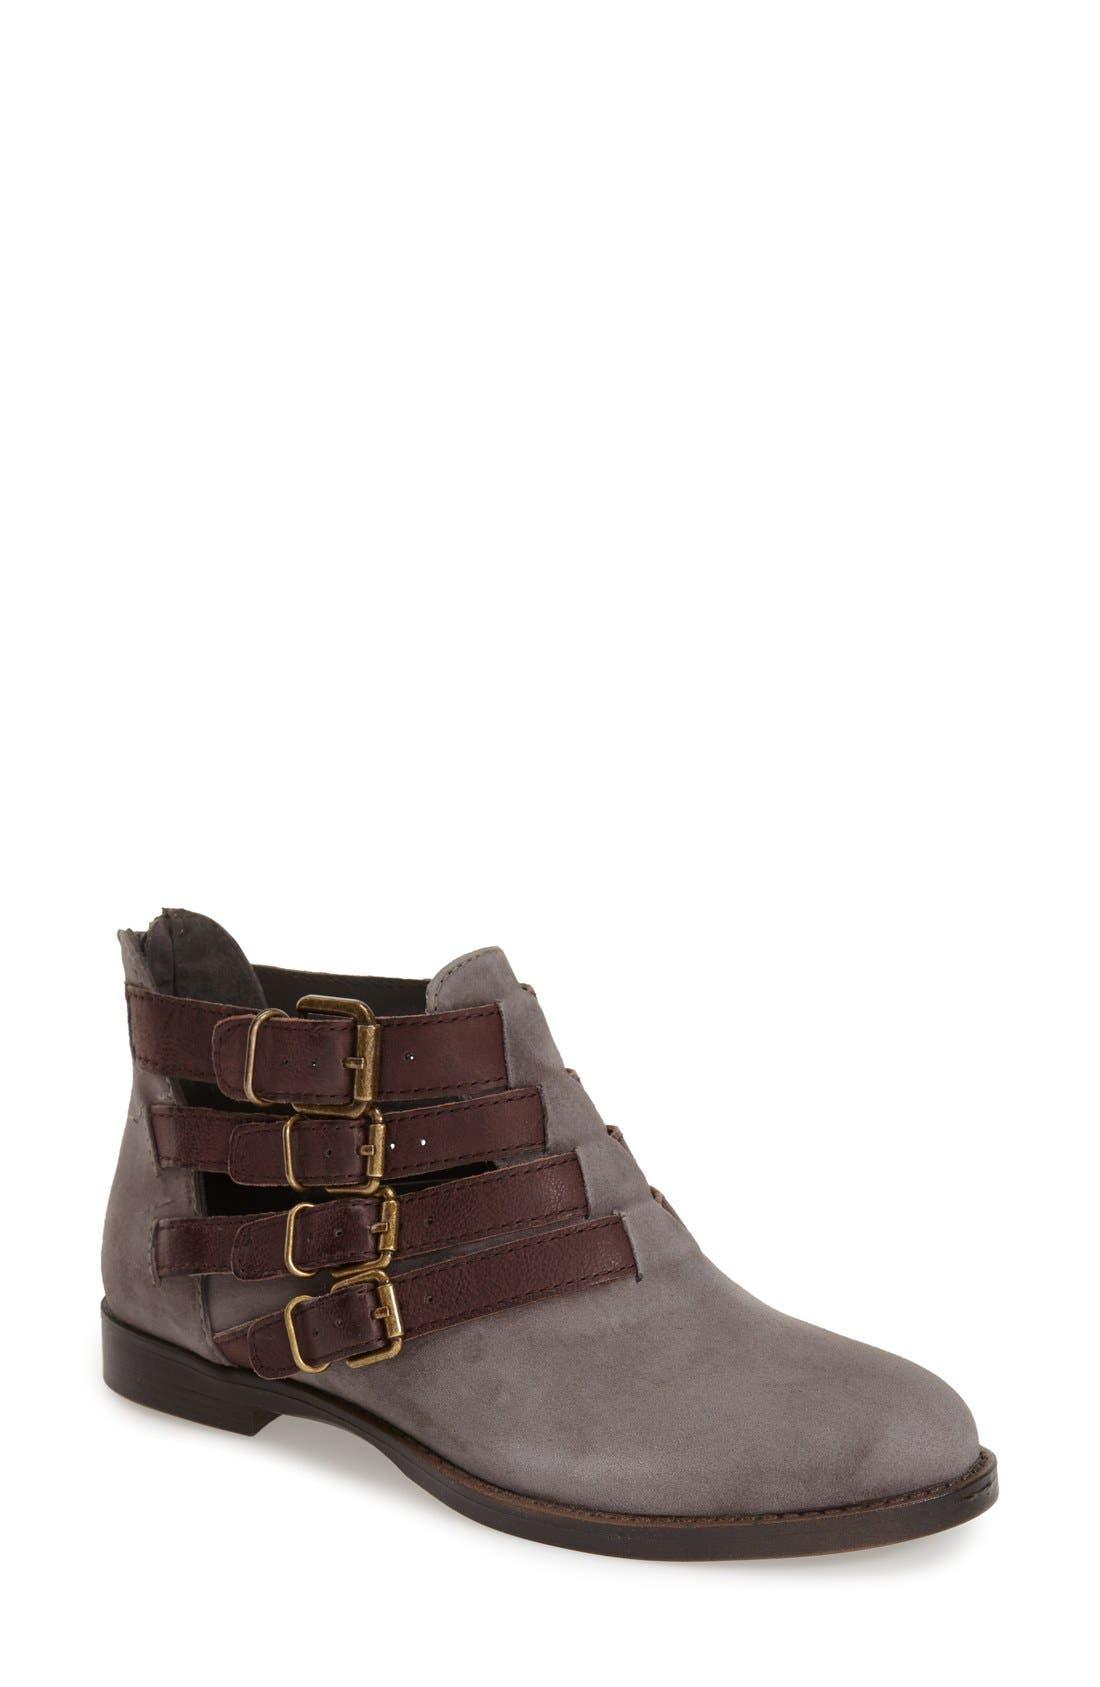 'Ronan' Buckle Leather Bootie,                         Main,                         color, Grey Suede/ Chestnut